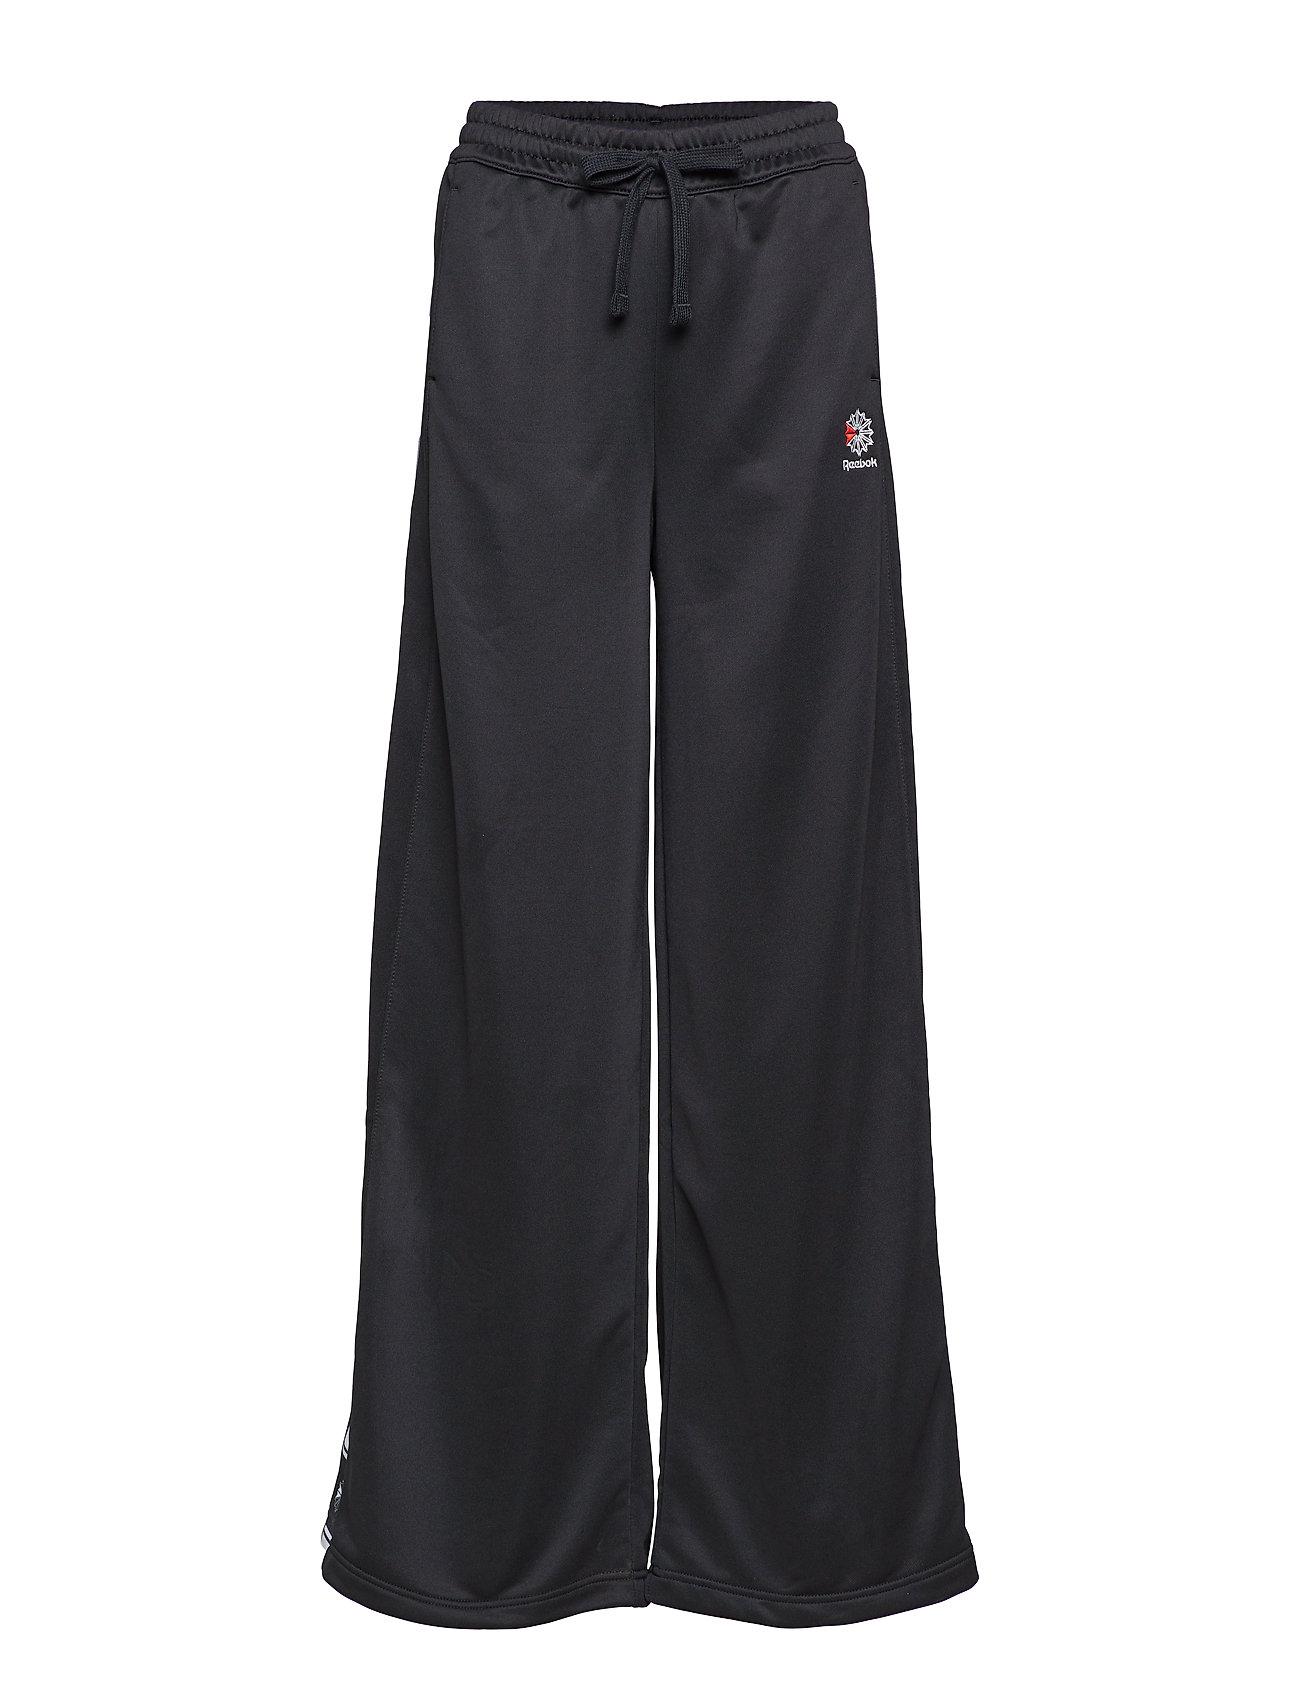 Reebok Classics CL TRACKPANTS Sweatpants